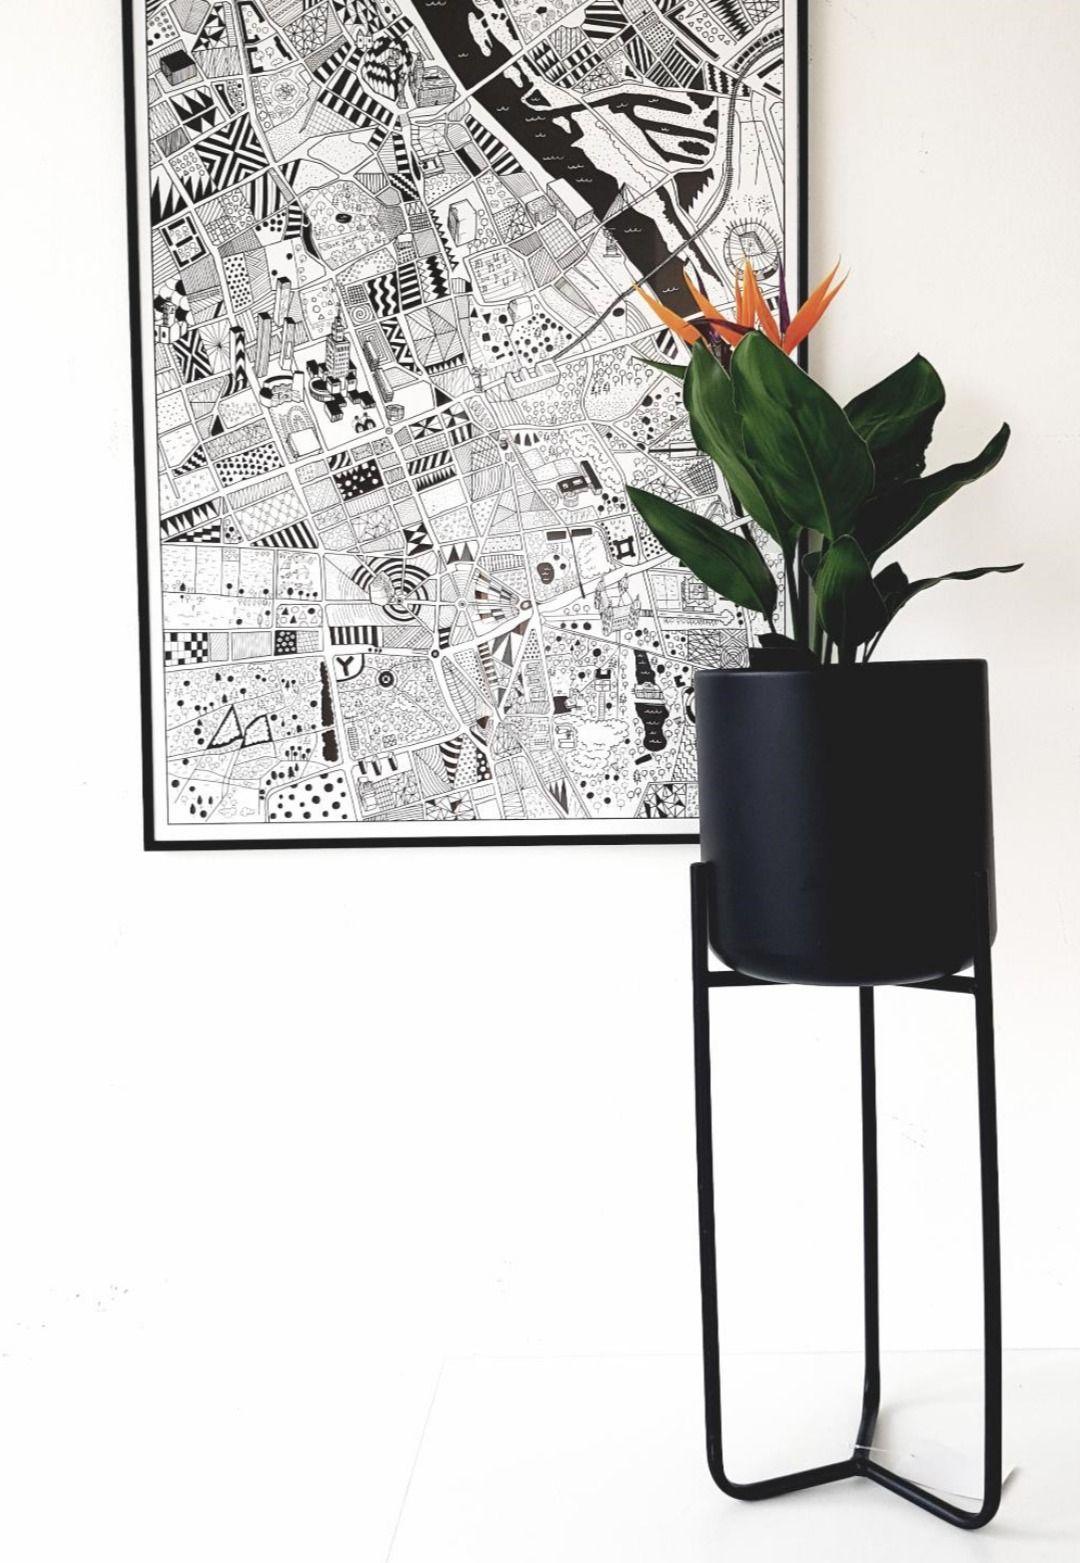 Czarny Stojak Na Rosliny Doniczkowe Design Side Table Decor